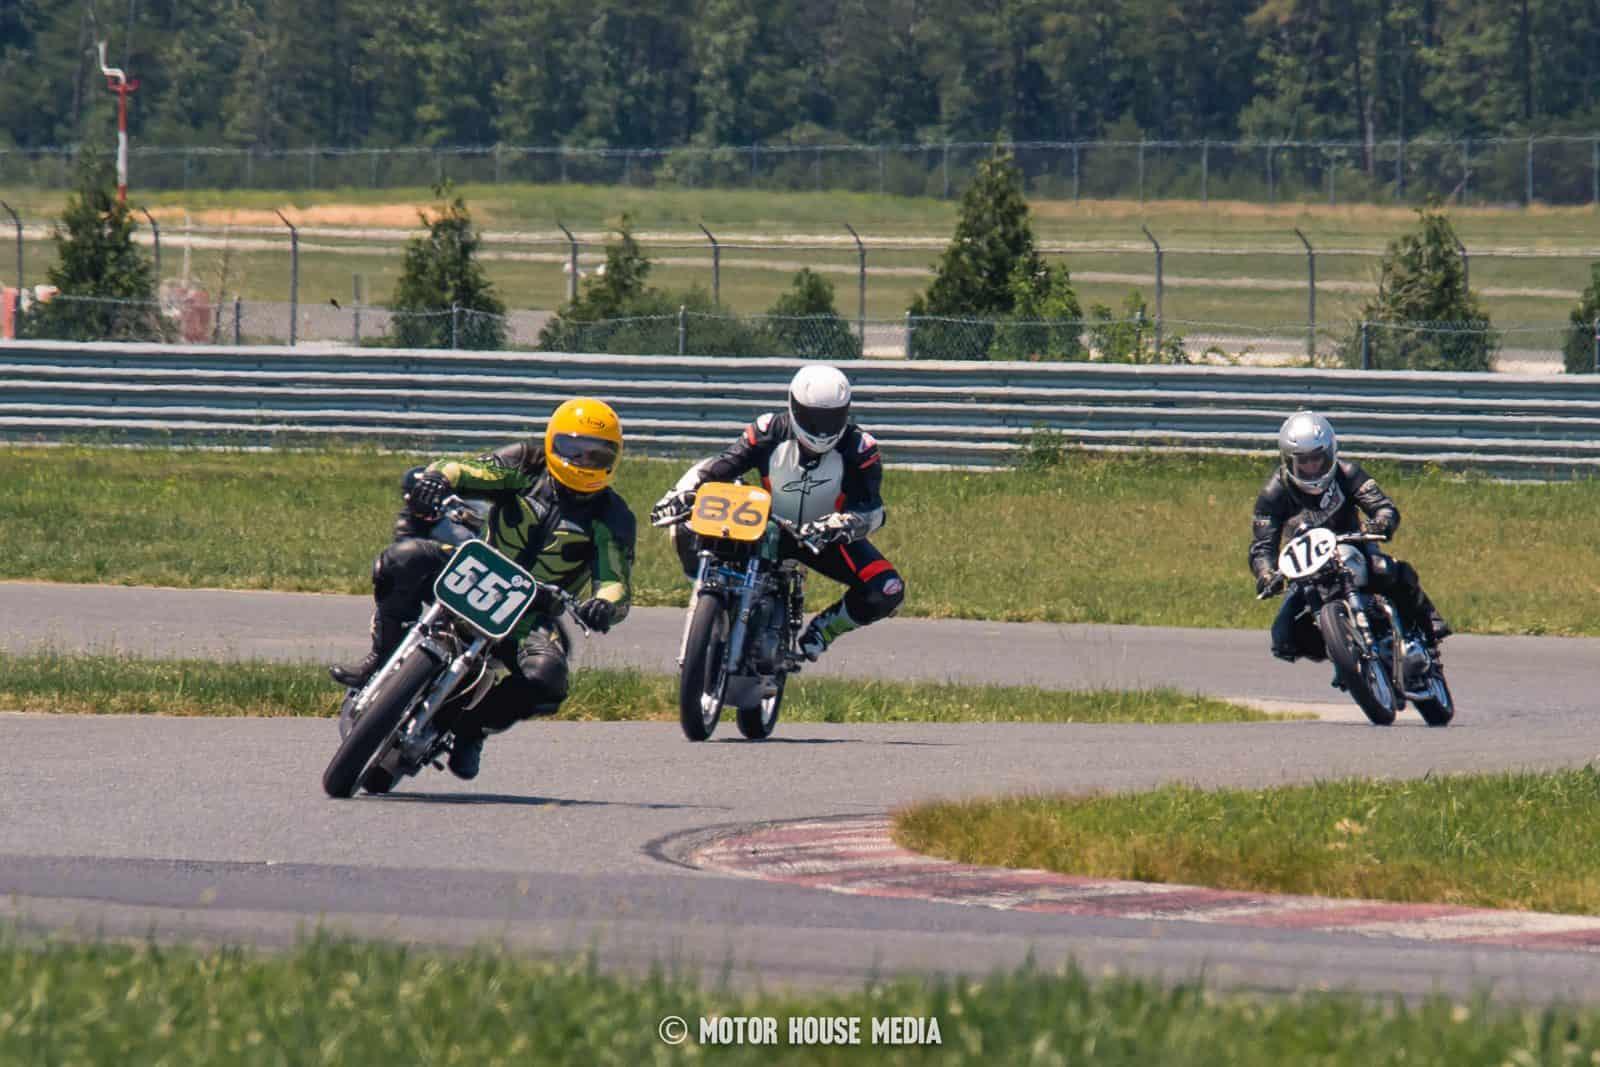 AHRMA vintage bikes competing on track